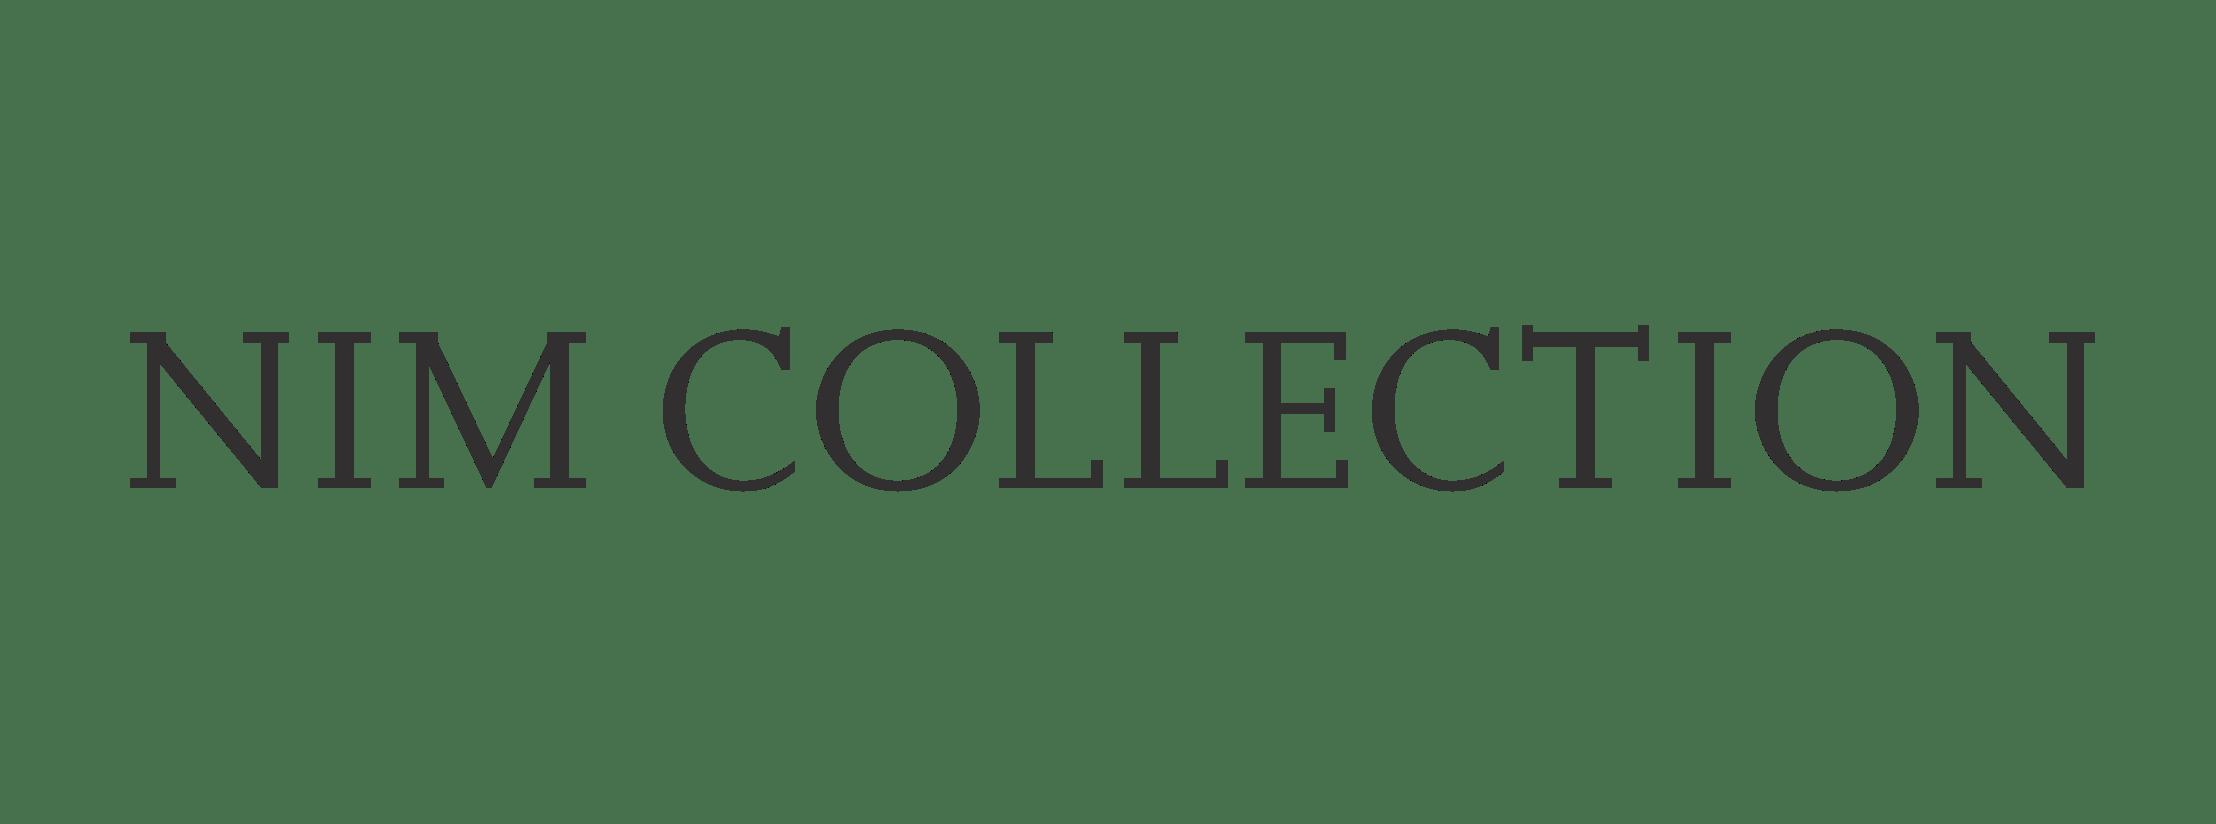 Nim Collection logo